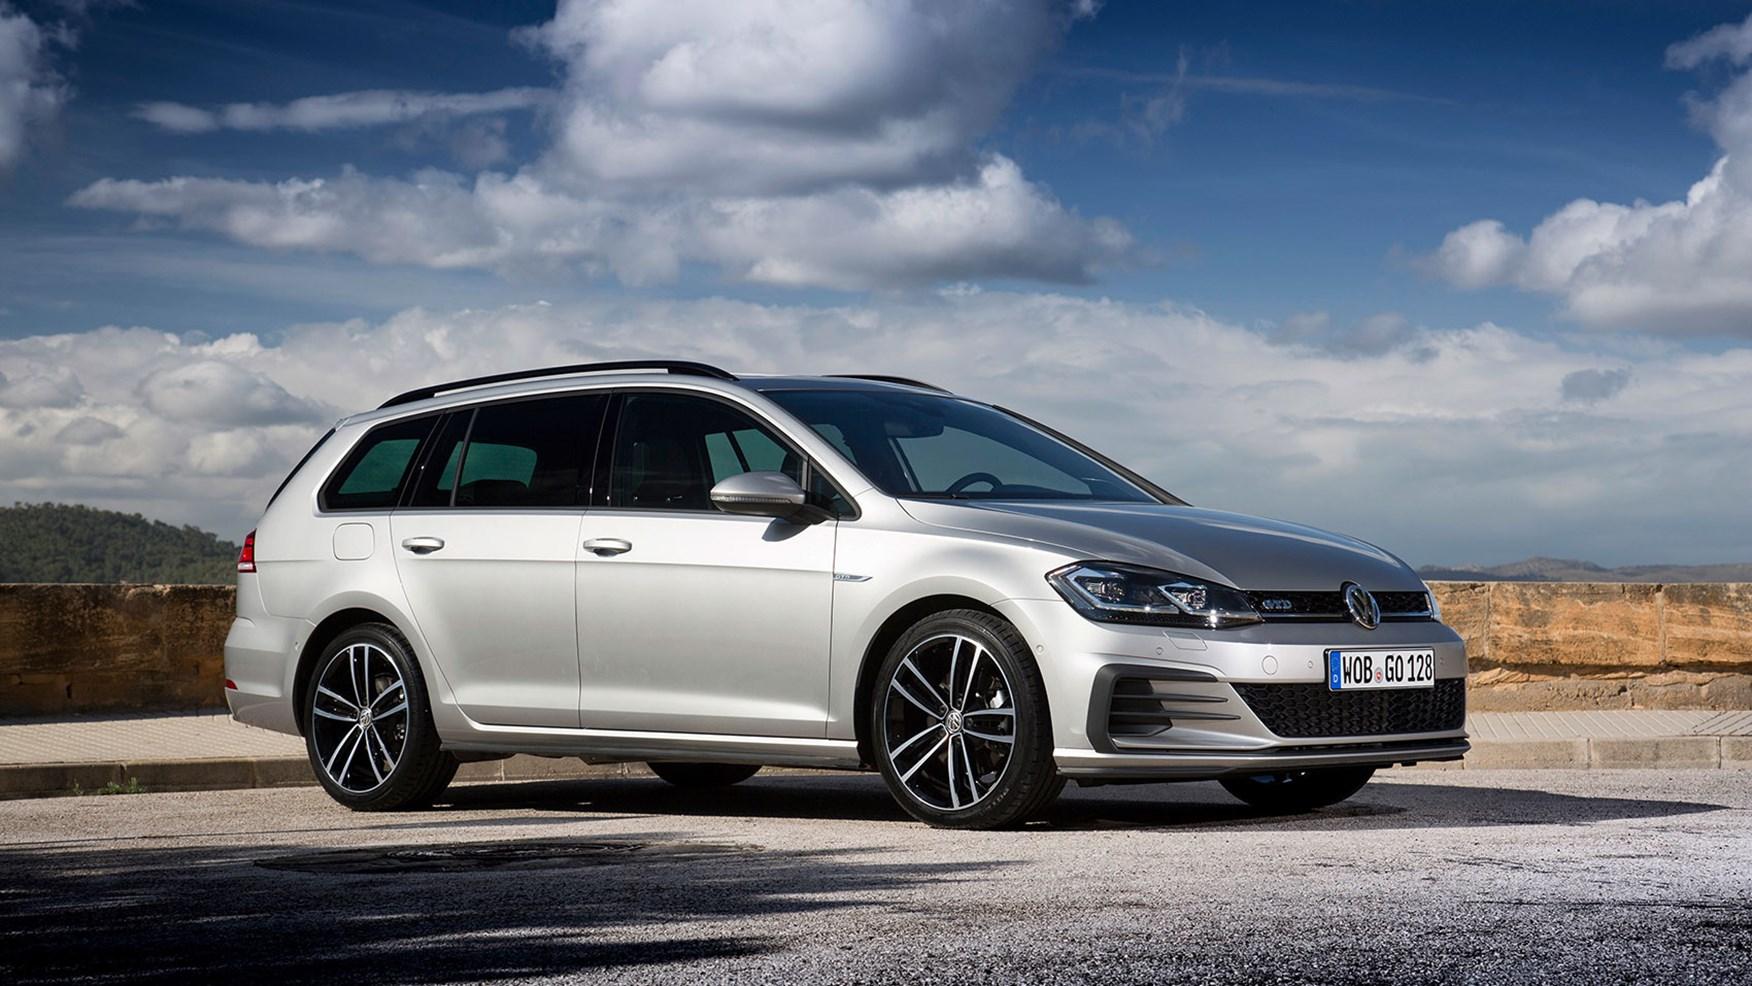 0 Down Lease Deals >> VW Golf GTD Estate (2017) review by CAR Magazine